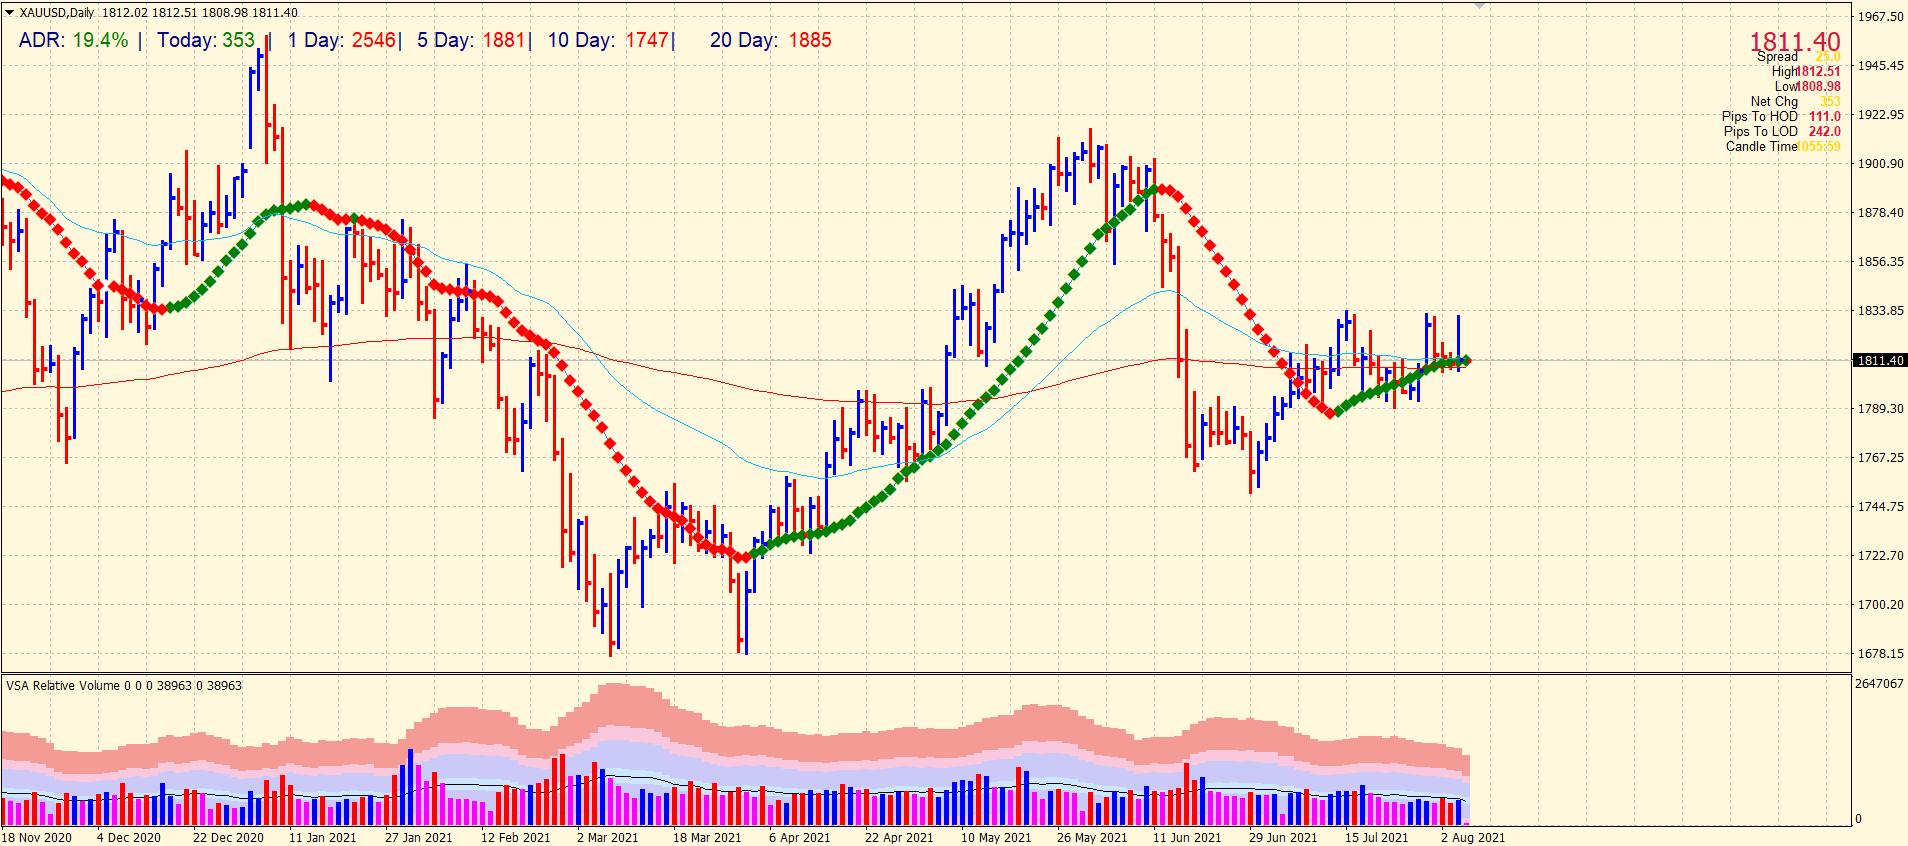 Gold 4-hour chart analysis